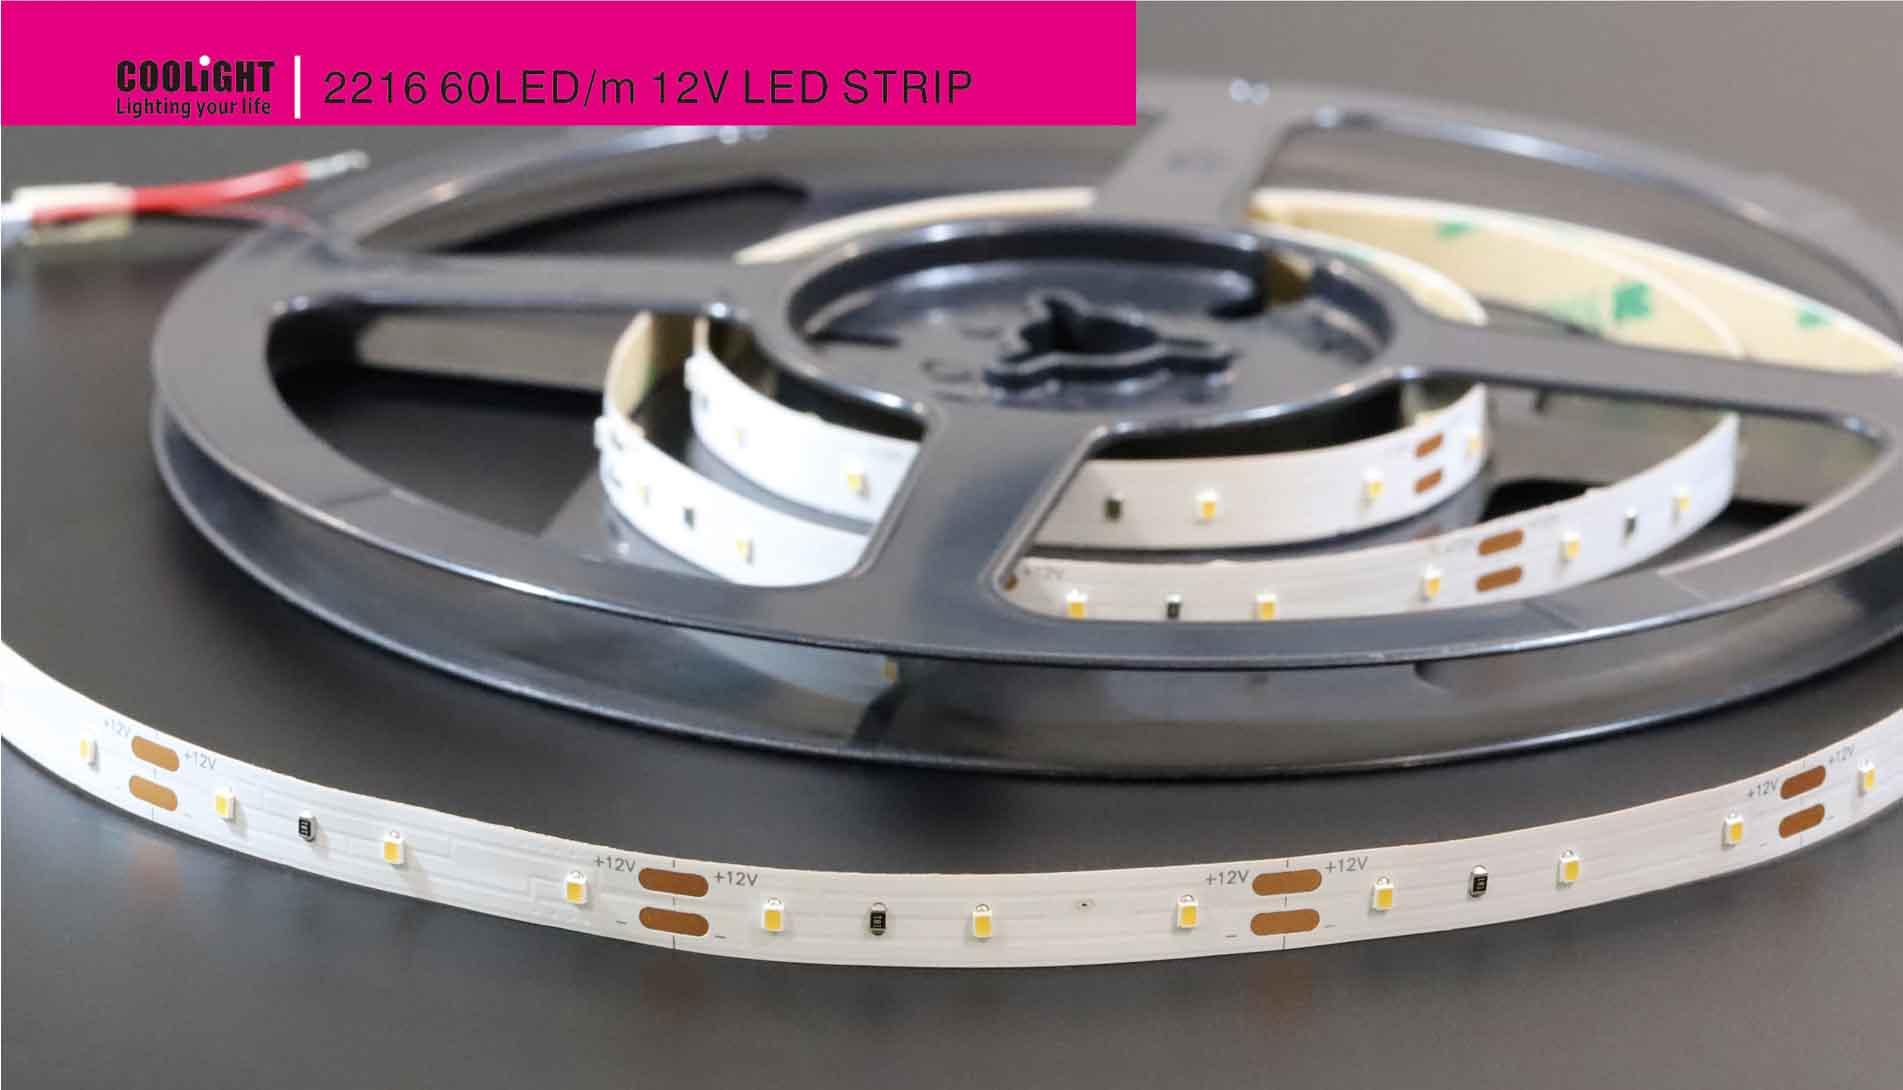 2216 60ledm 12v led strip